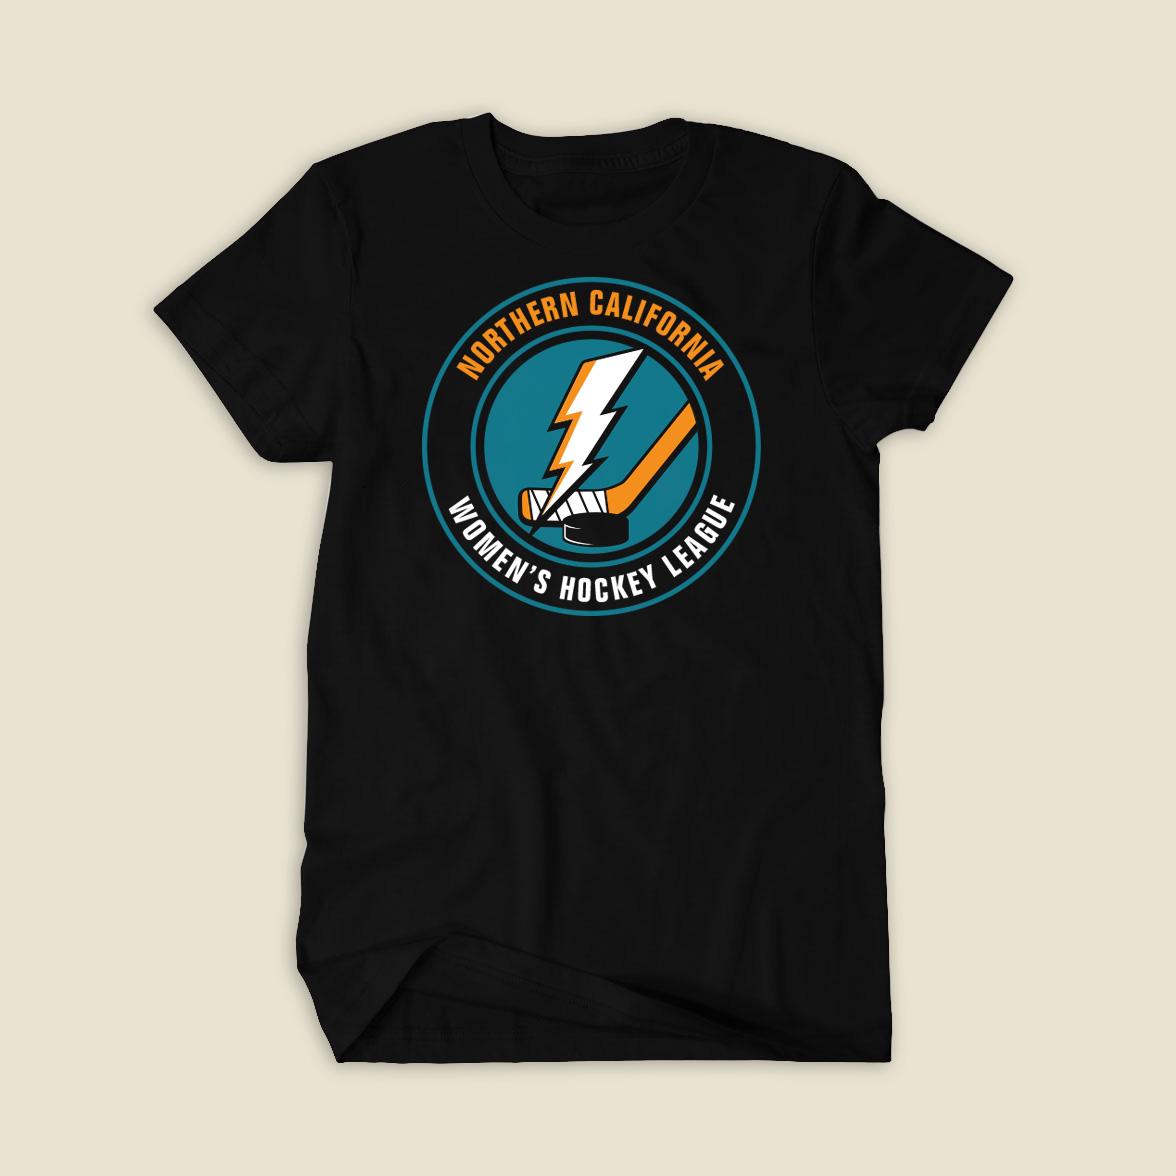 NCWHL-Tshirt-Circle-Sharks-Colors-OnShirt.jpg